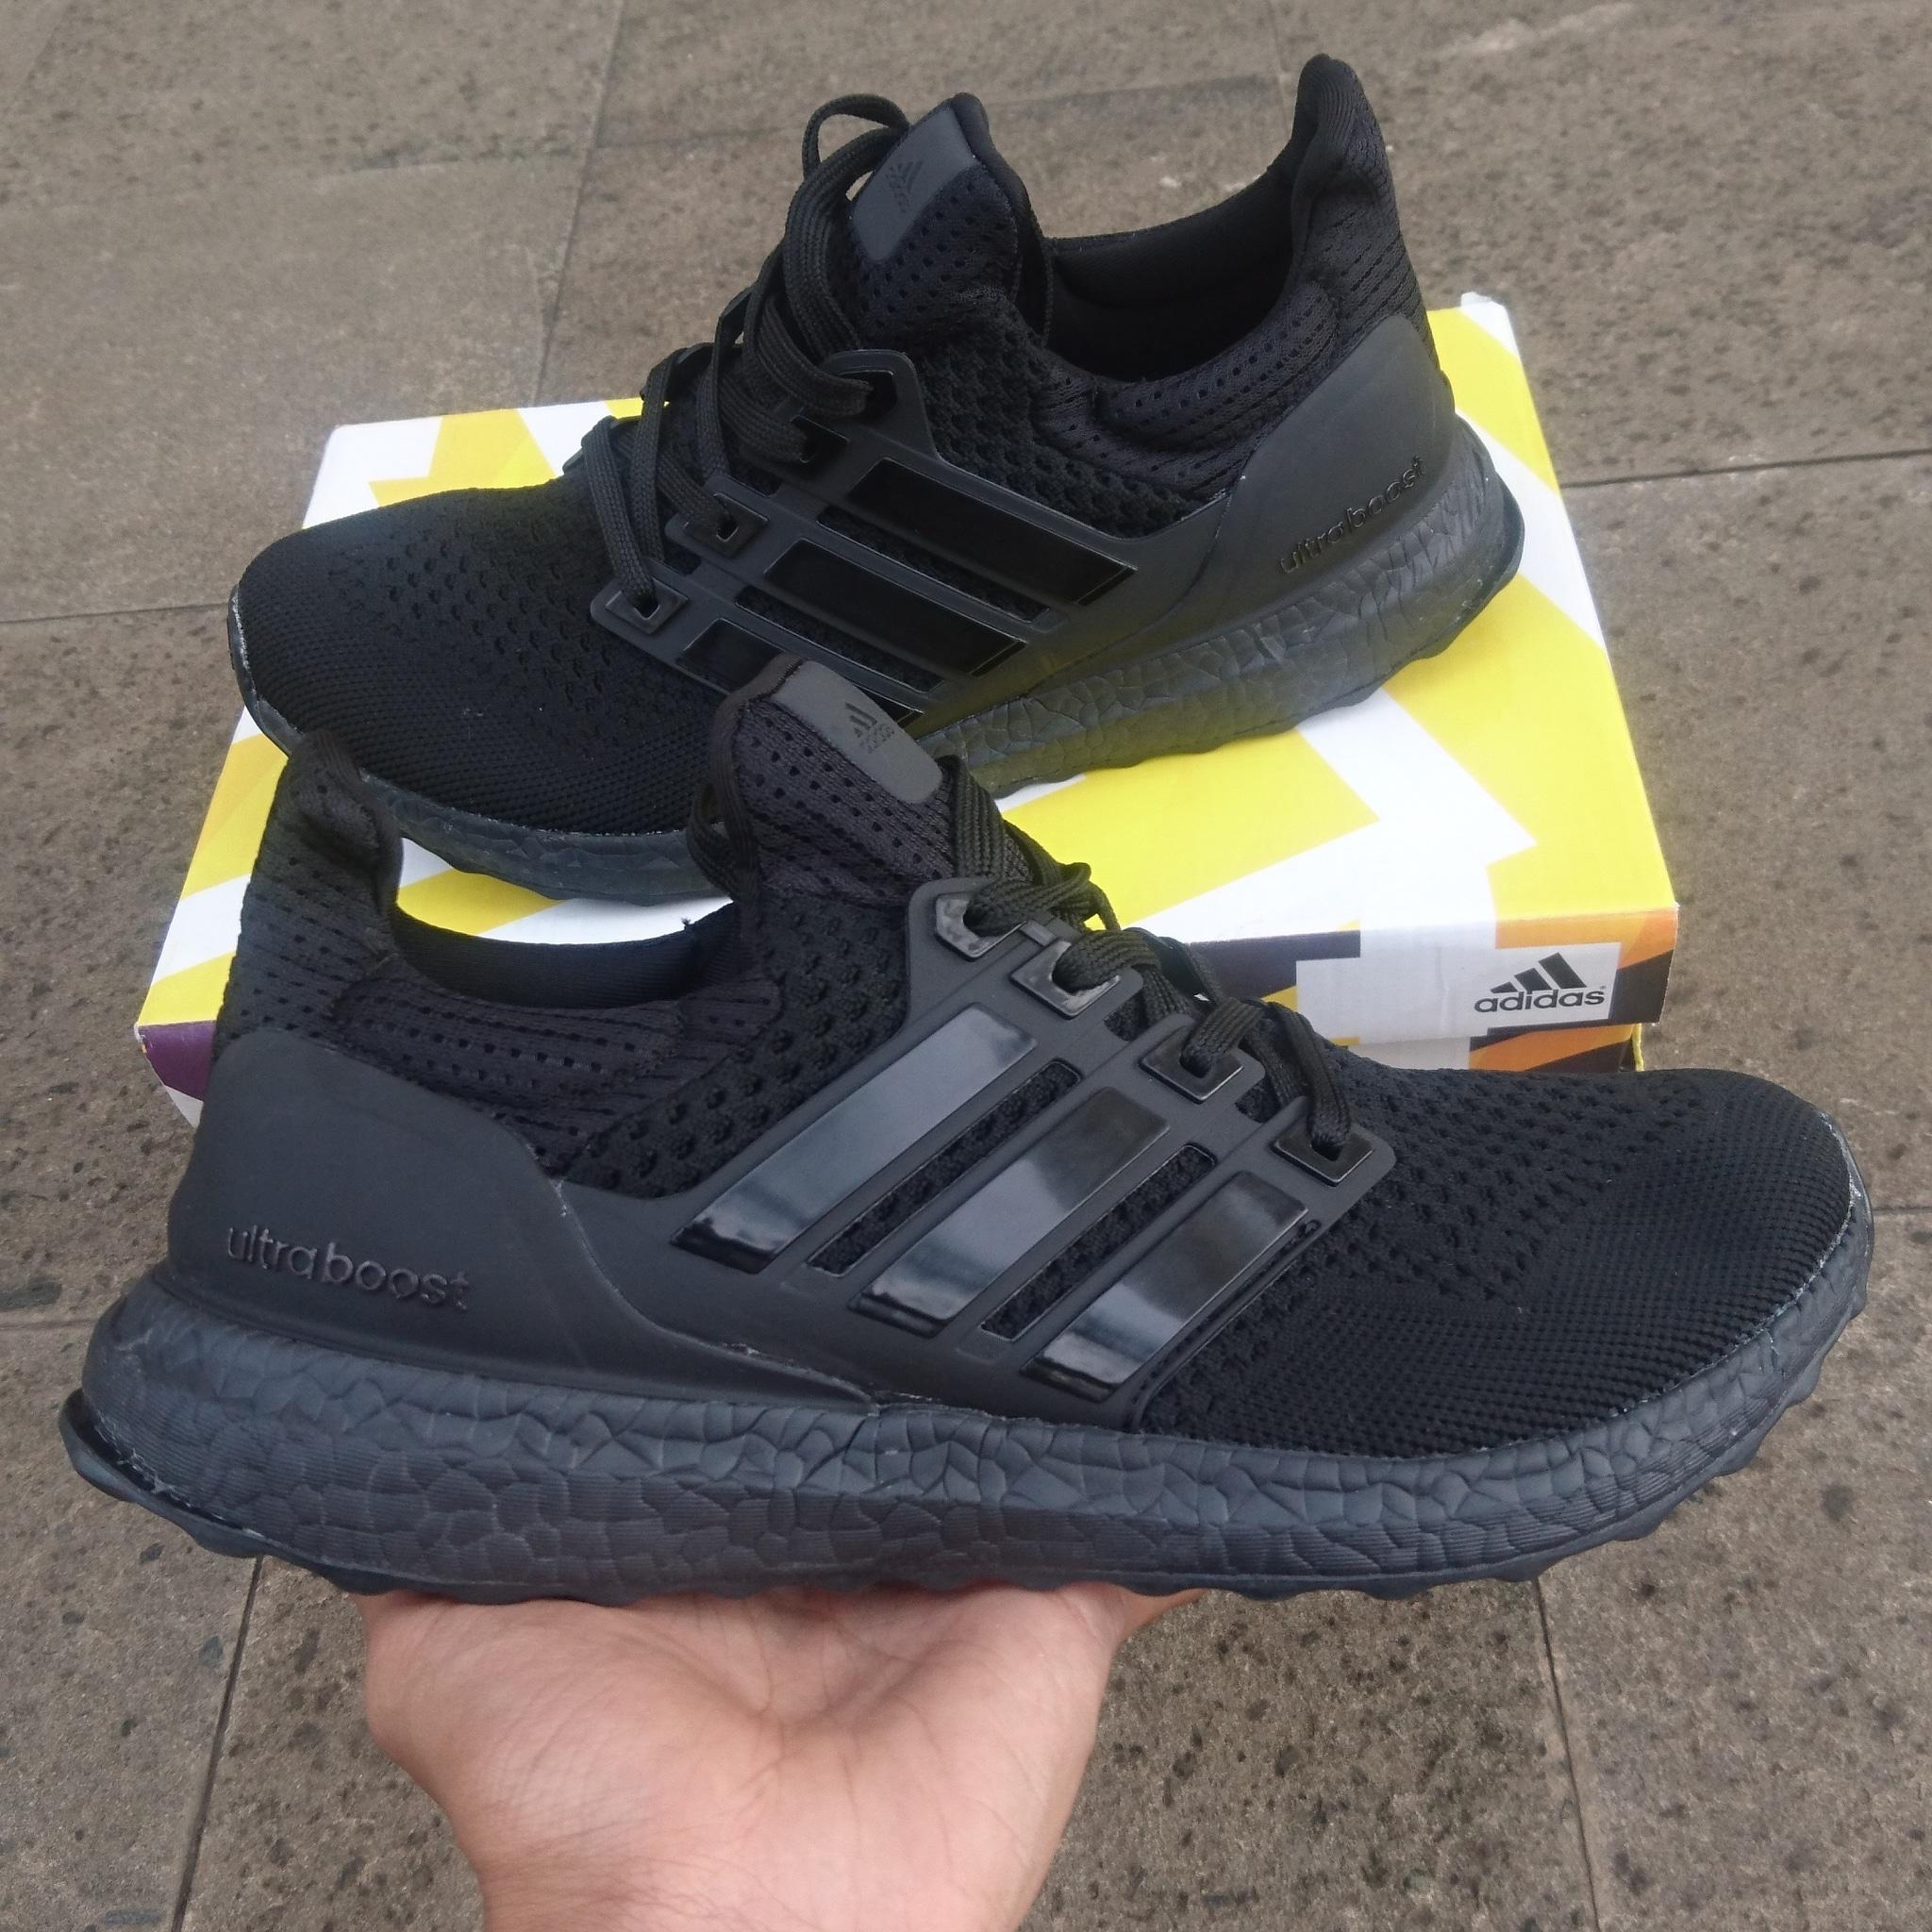 a27e12ceba70e ... sweden sweden adidas ultra boost black harga jual sepatu adidas ultra  boost triple black premium quality